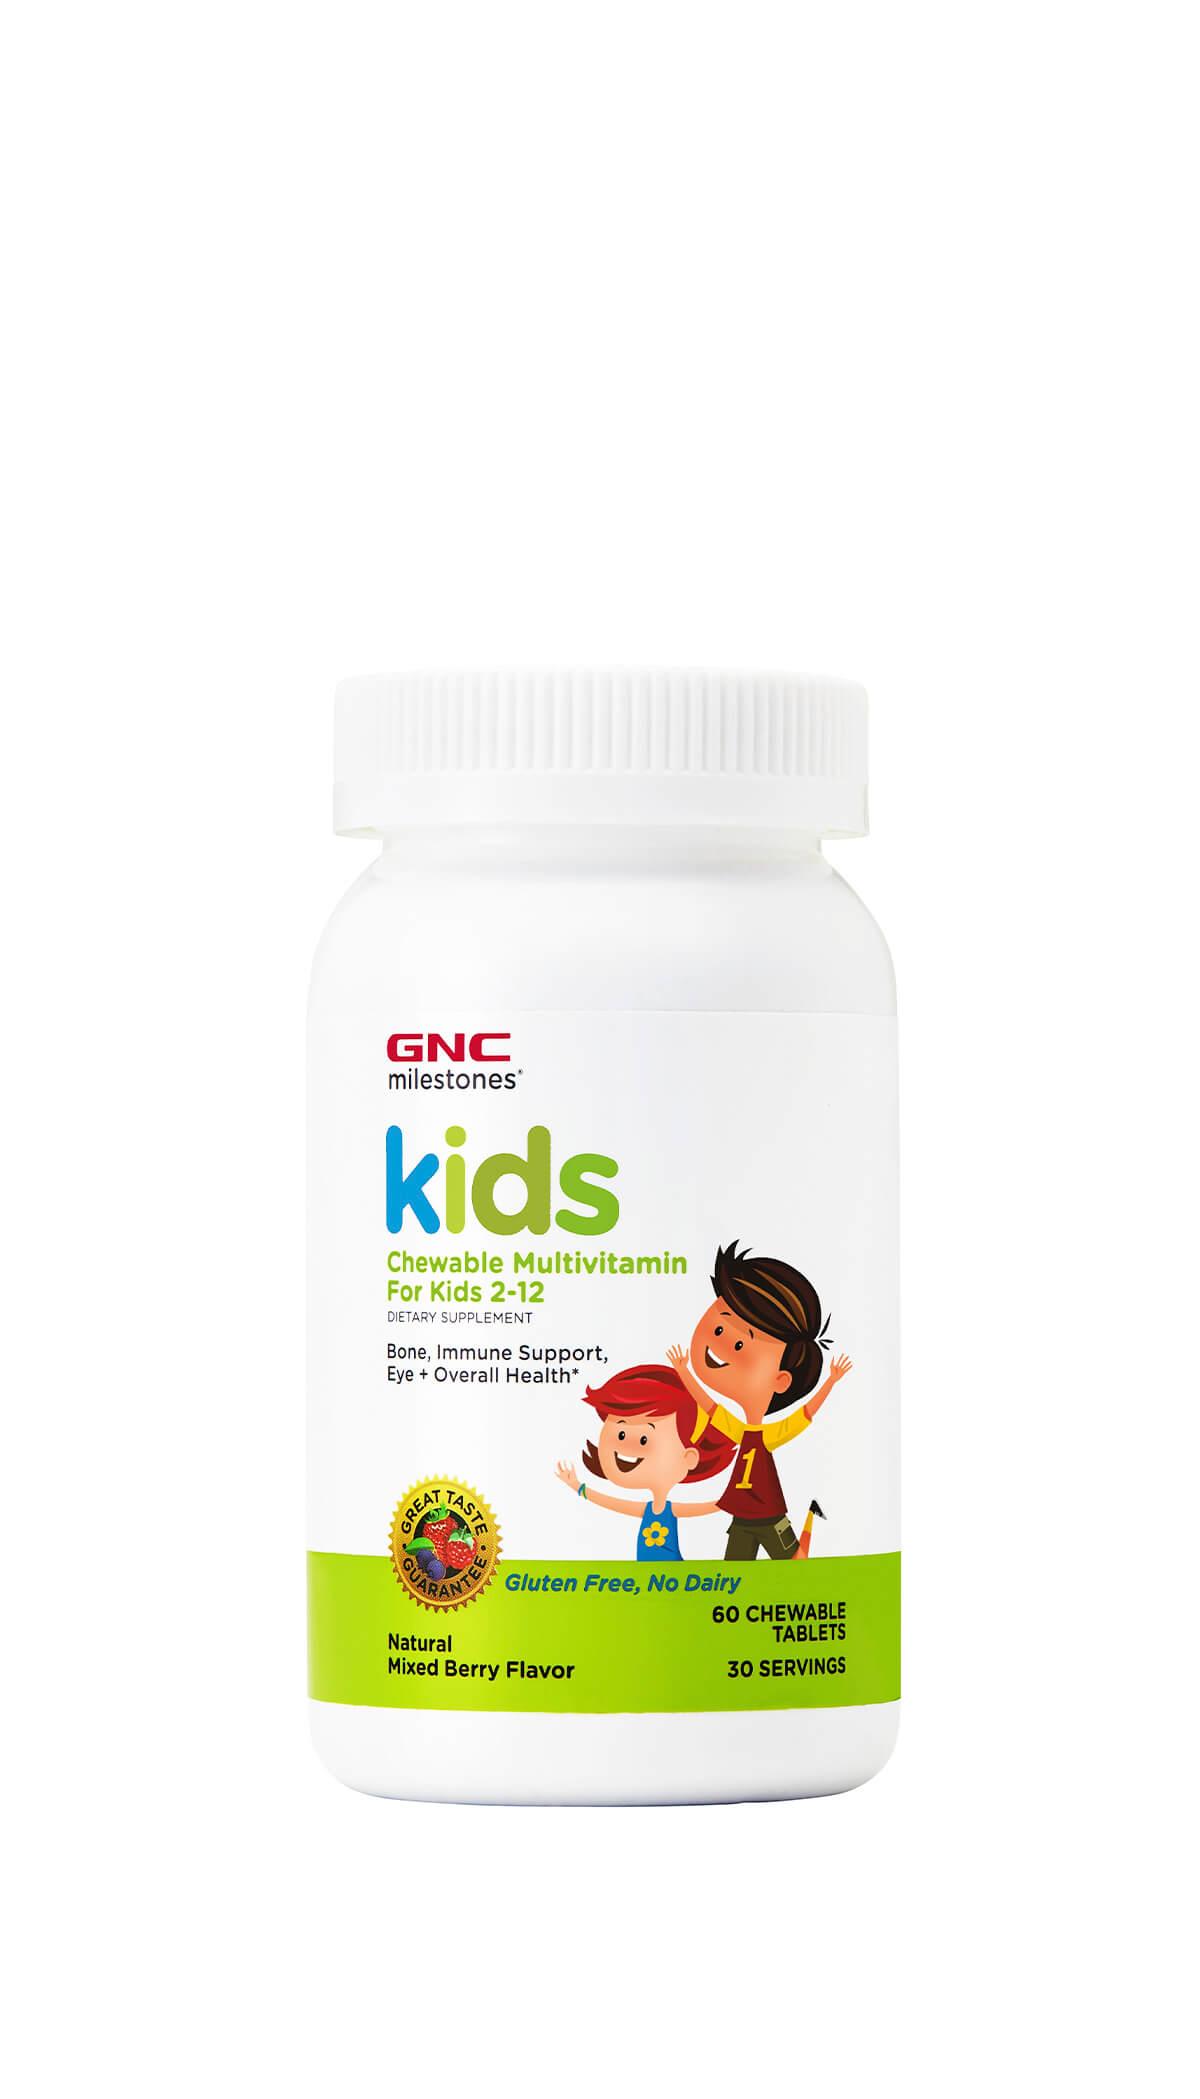 GNC儿童多种维他命咀嚼片